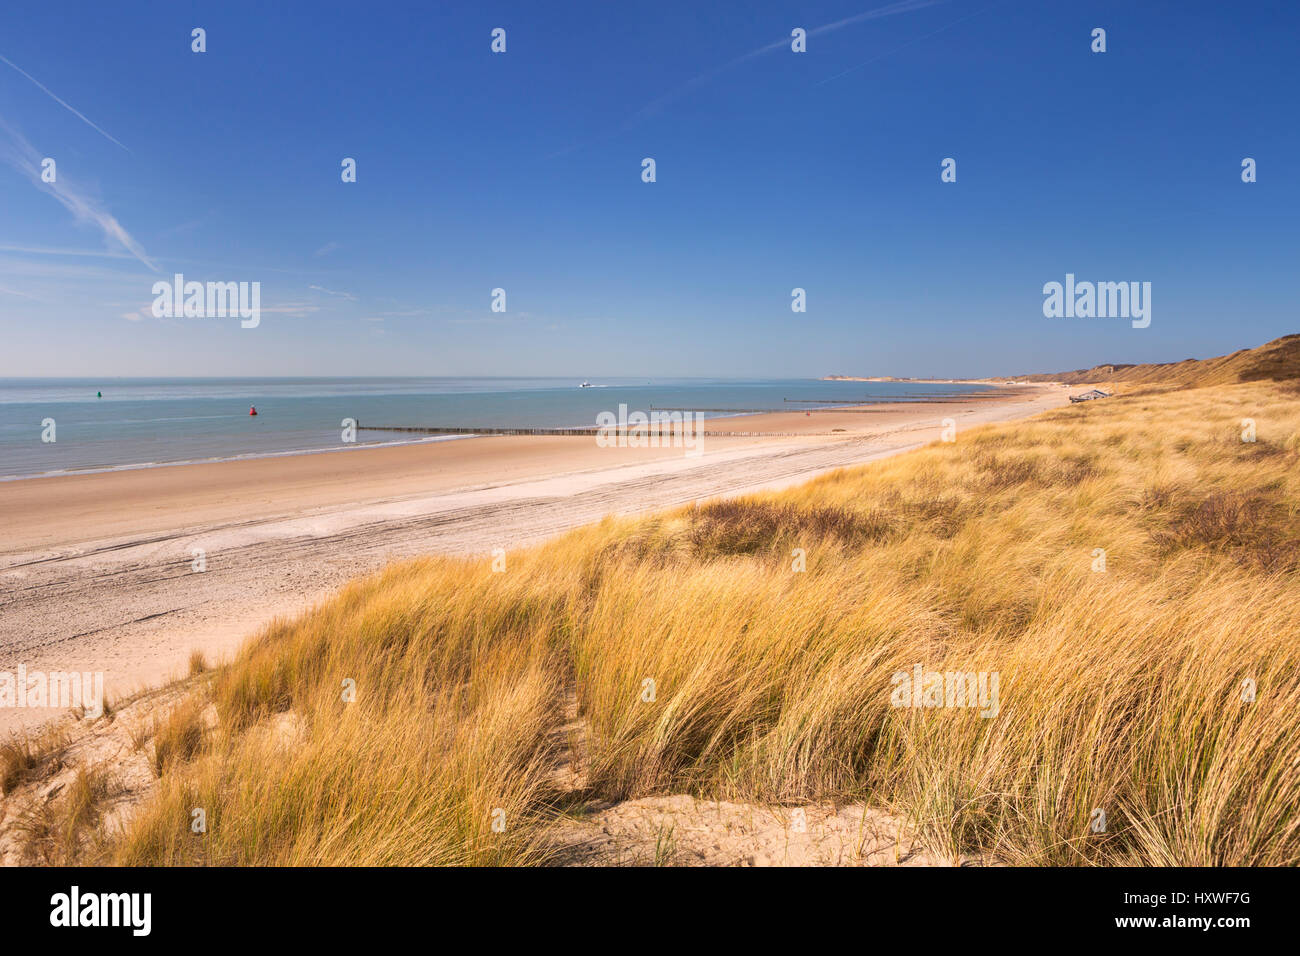 Dunes on the coast of Dishoek in Zeeland, The Netherlands. - Stock Image